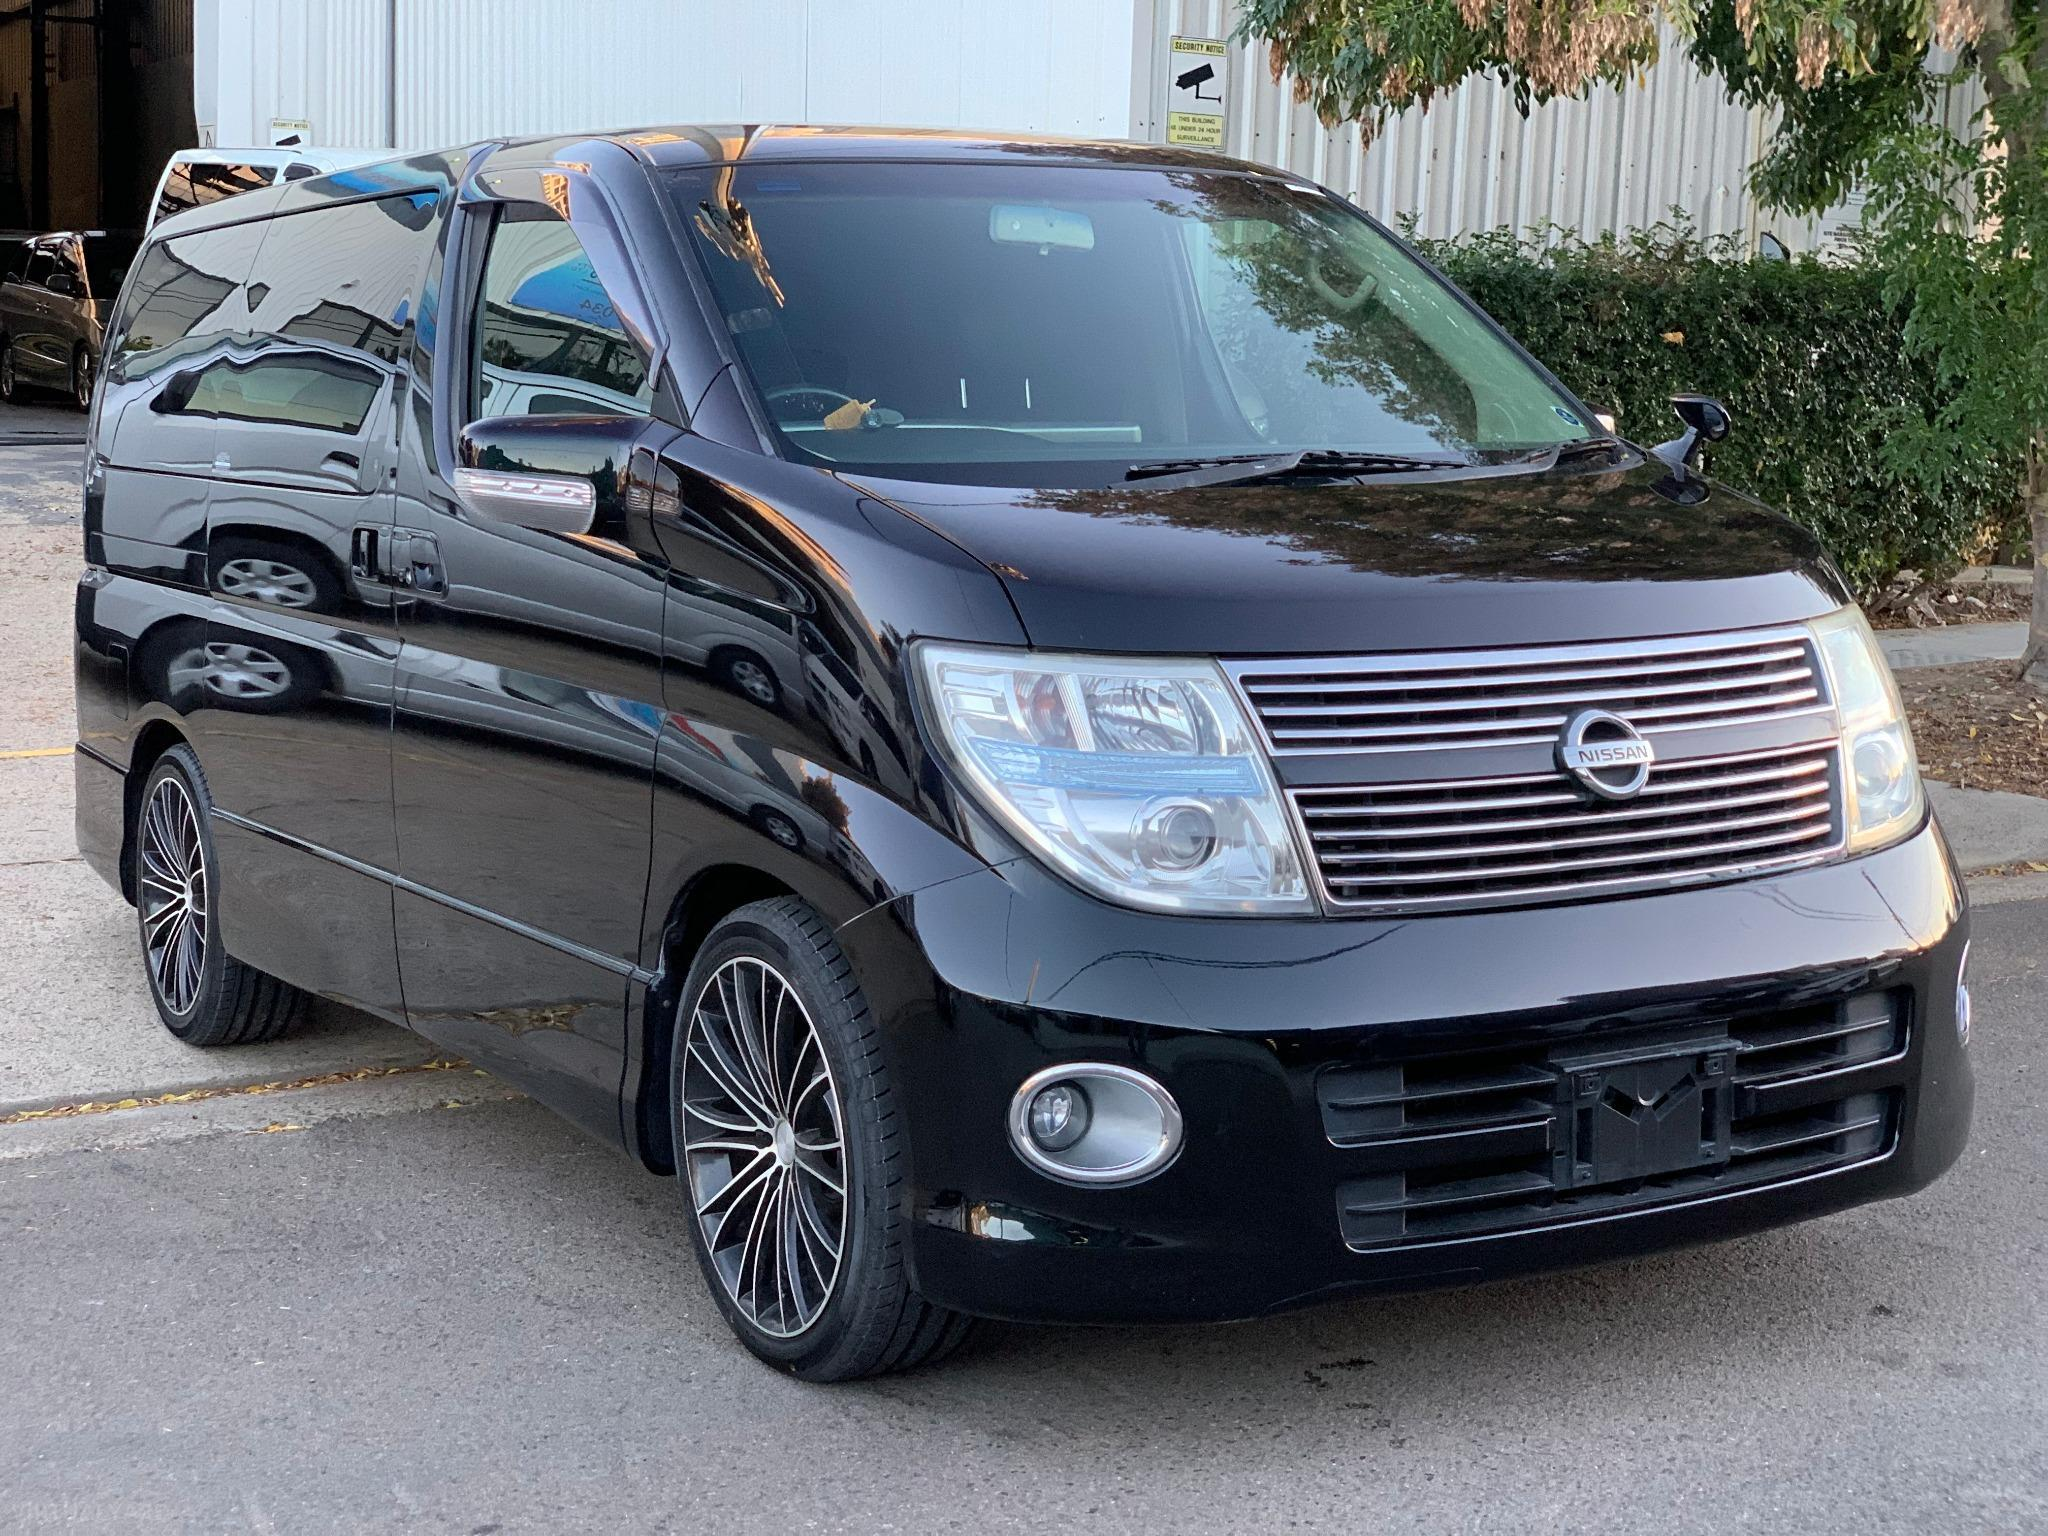 Nissan Elgrand E51 Highwaystar Premium Wagon 8st 5dr Auto